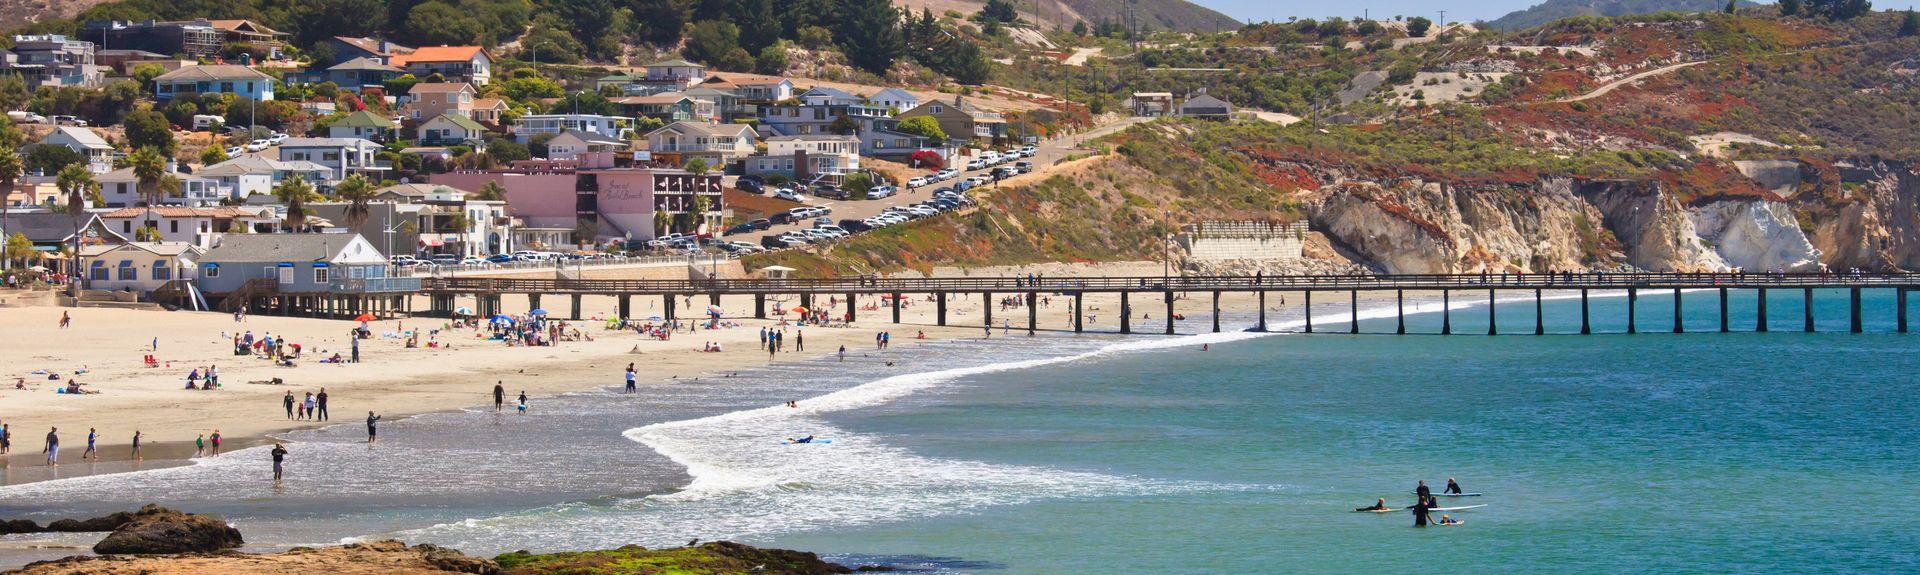 Avila Beach, CA, USA